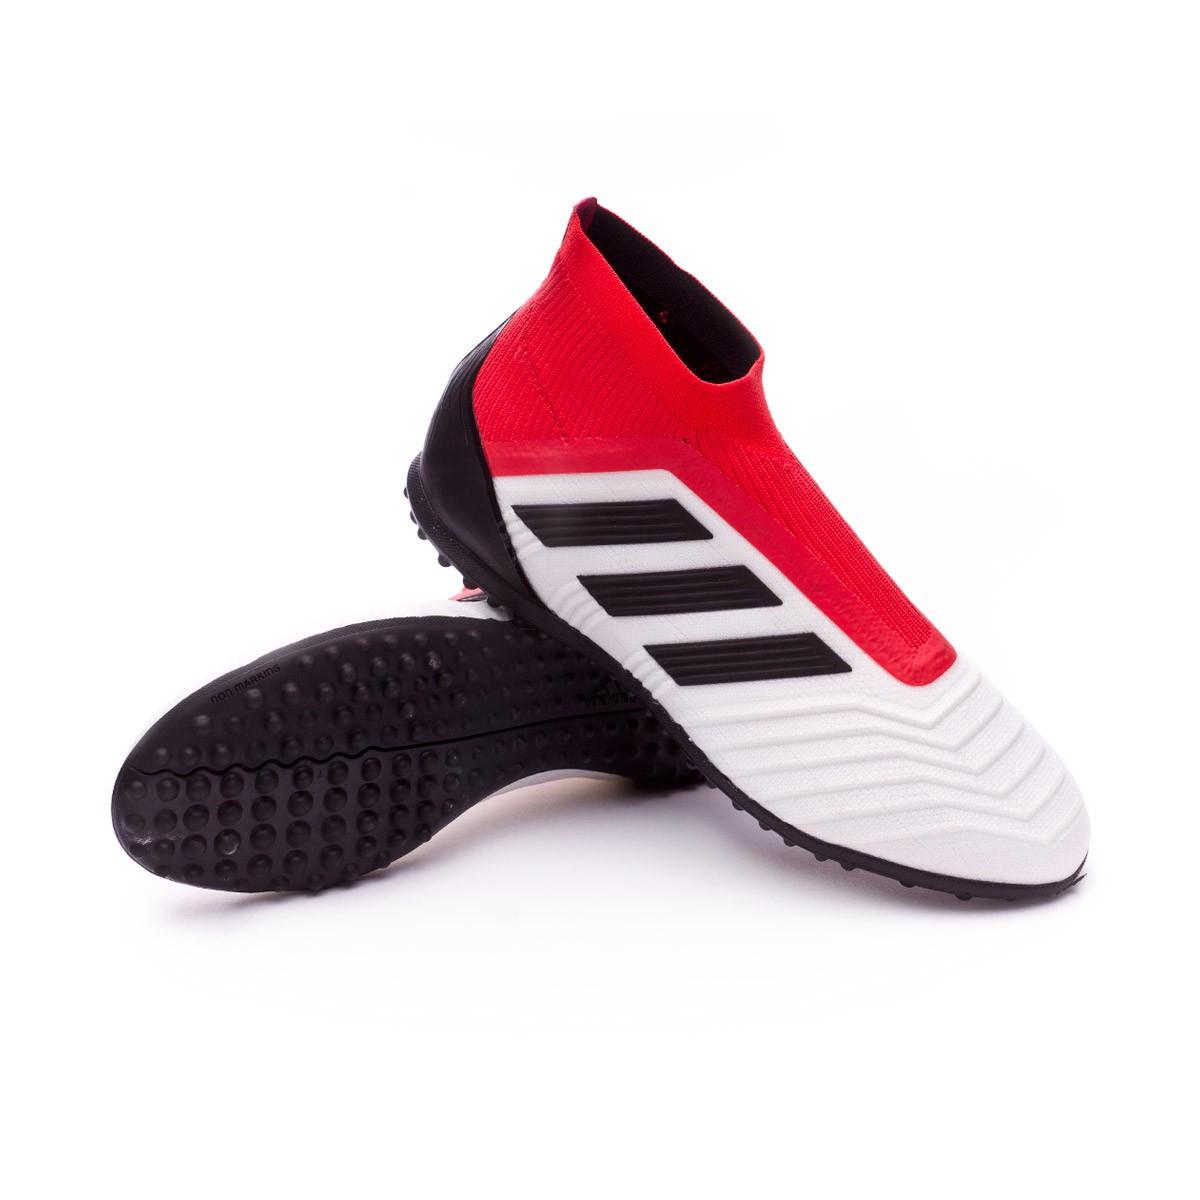 023dd5db4031d ... cheapest zapatilla adidas predator tango 18 turf niño white core black  real coral soloporteros es ahora ...